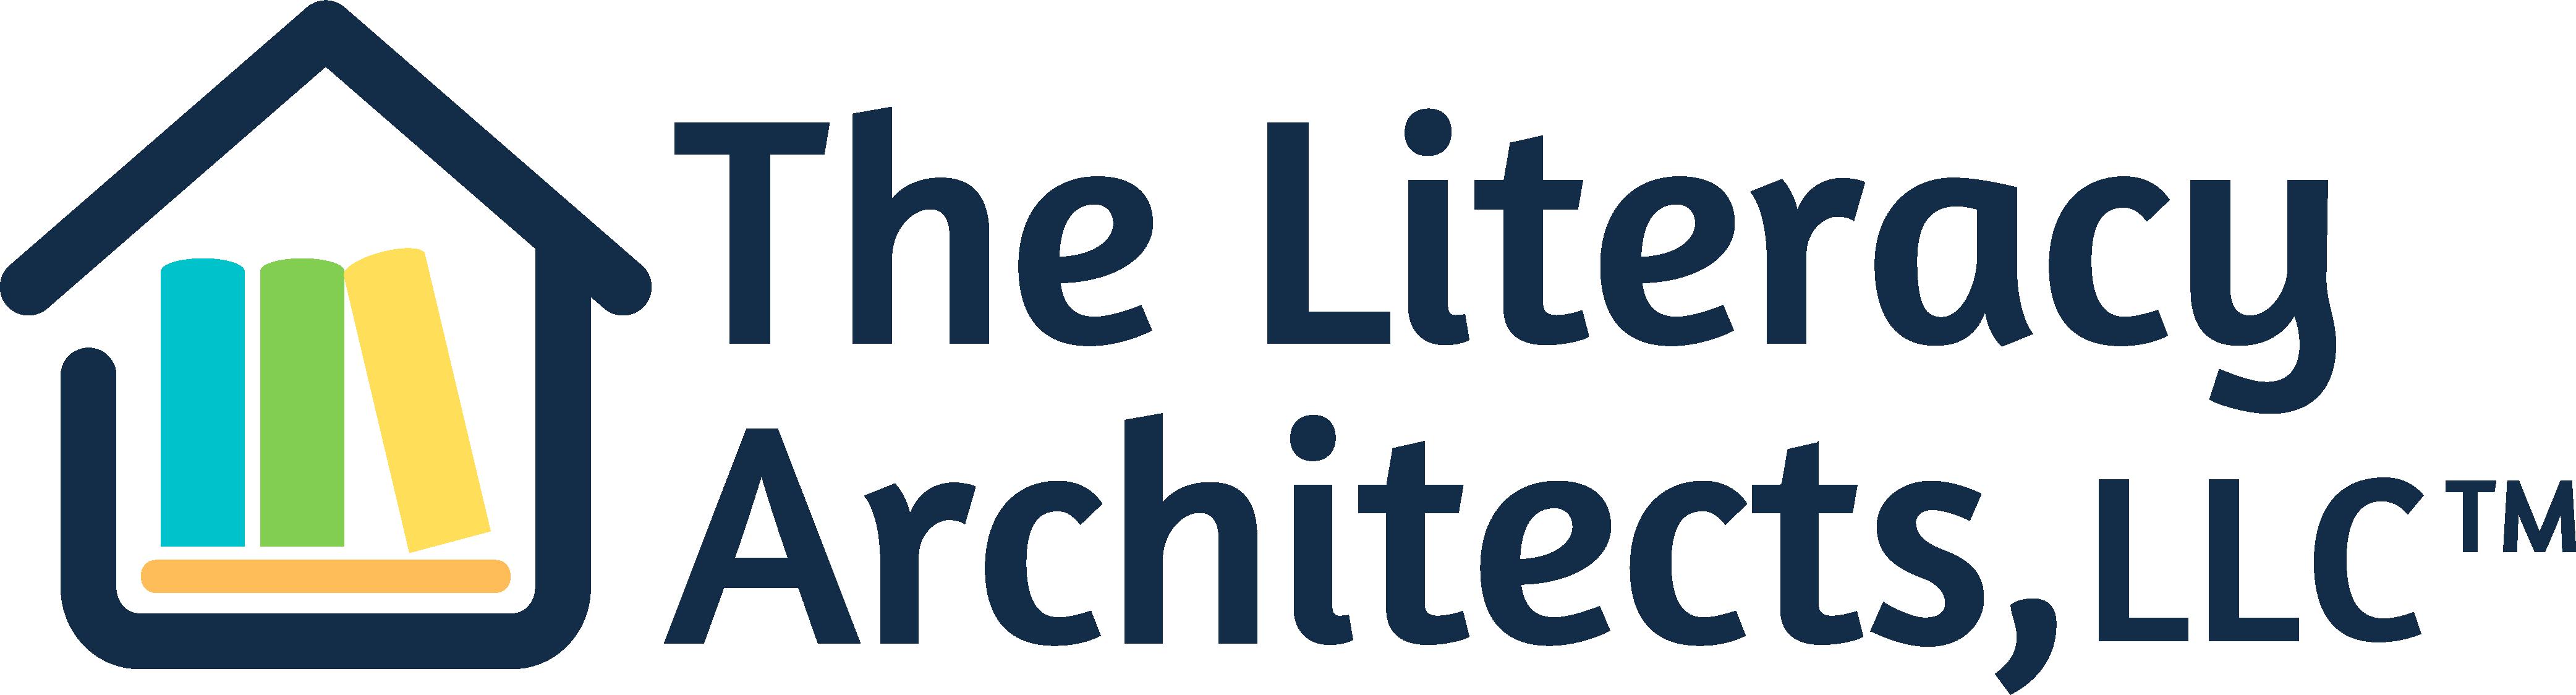 The Literacy Architects, LLC